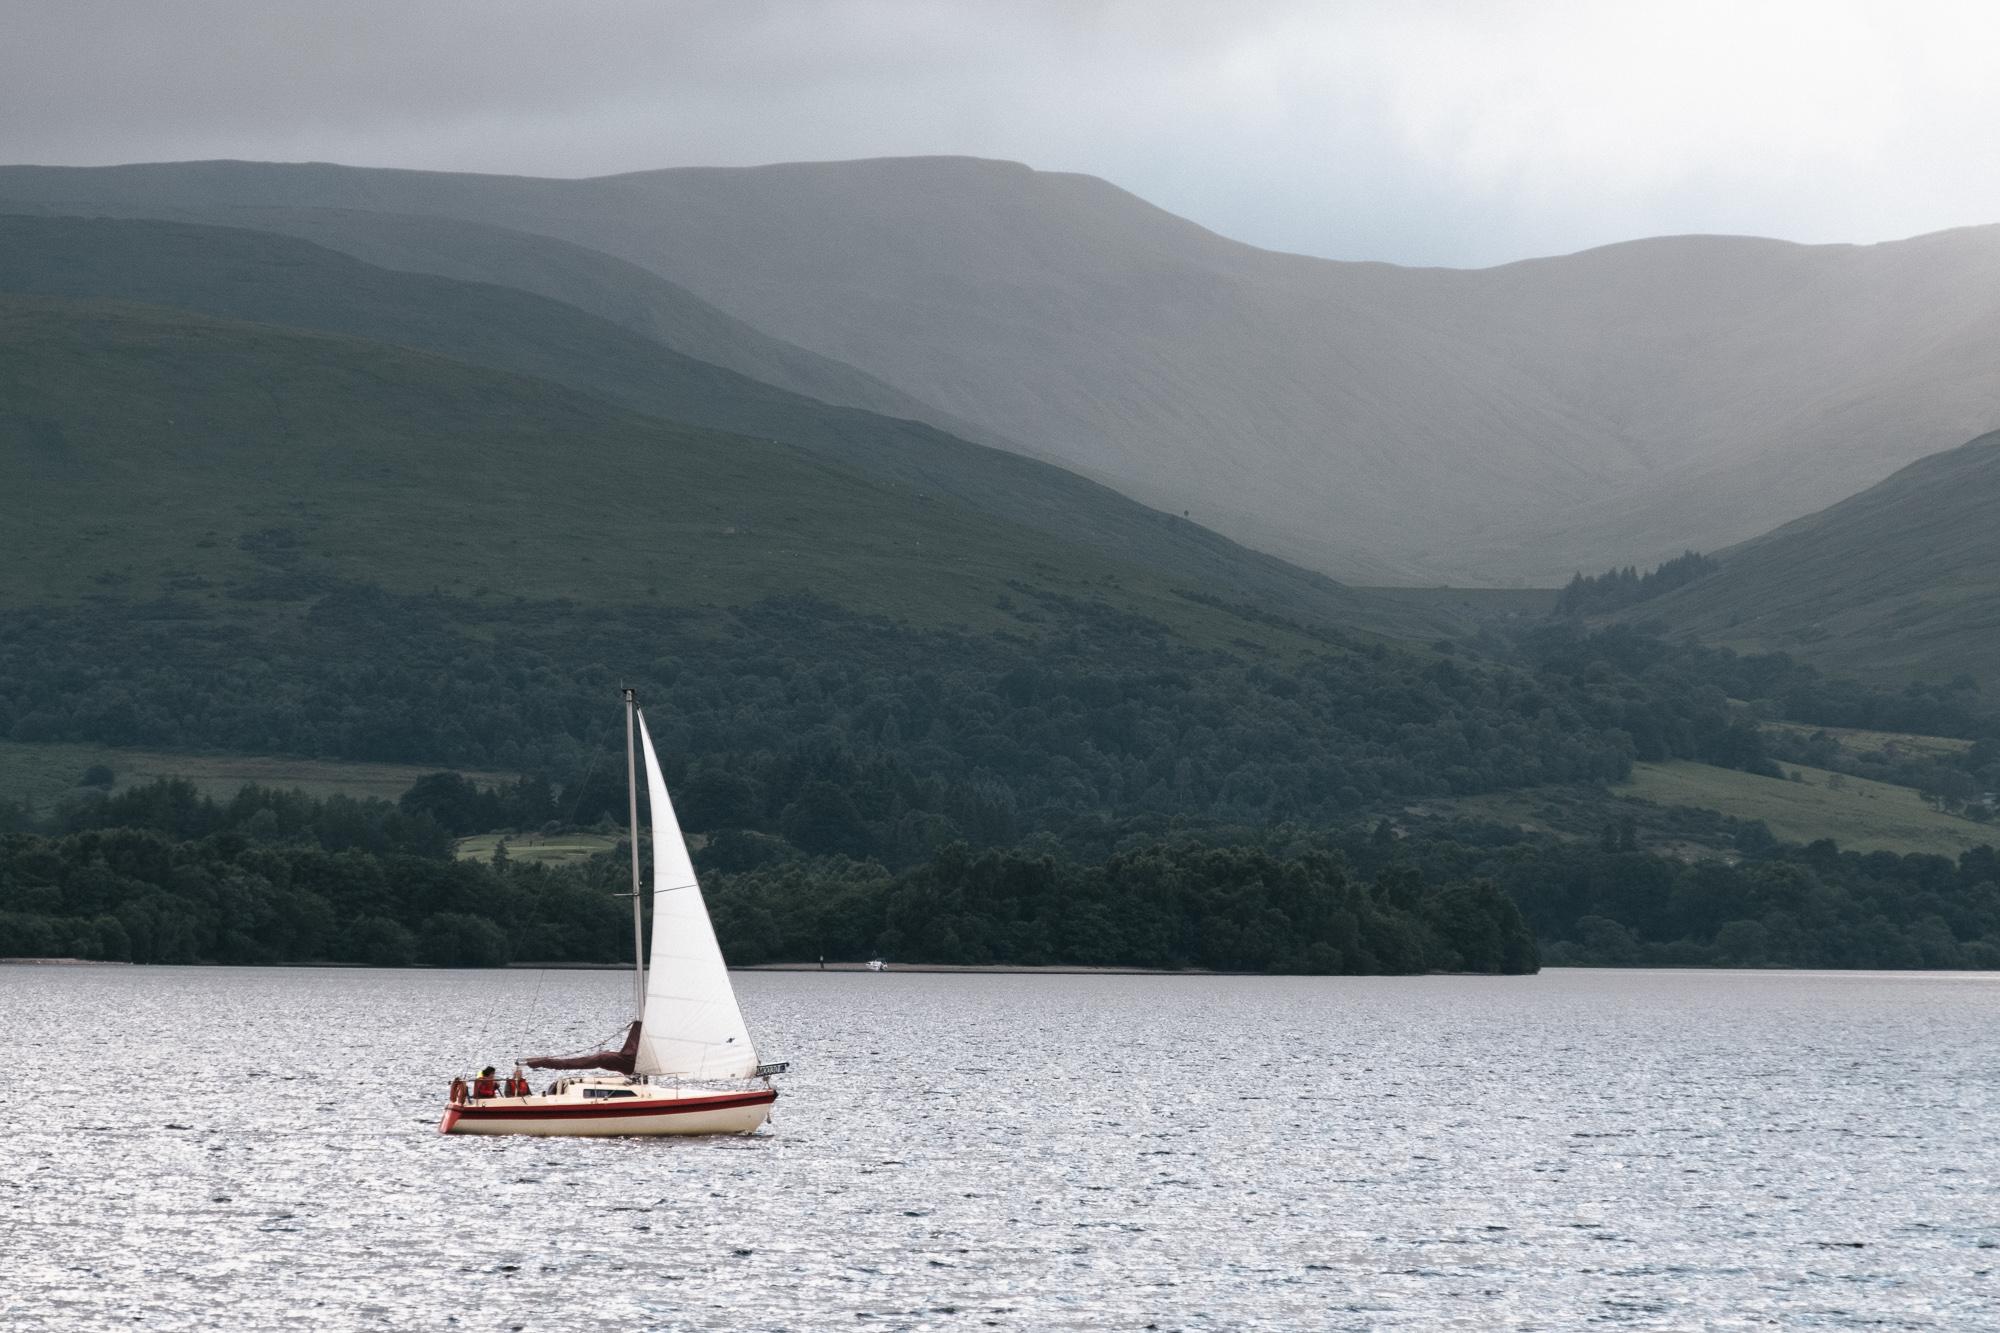 Scotland-trip-best-places-Sunset-Cruise-on-Loch-Lomond-24.jpg